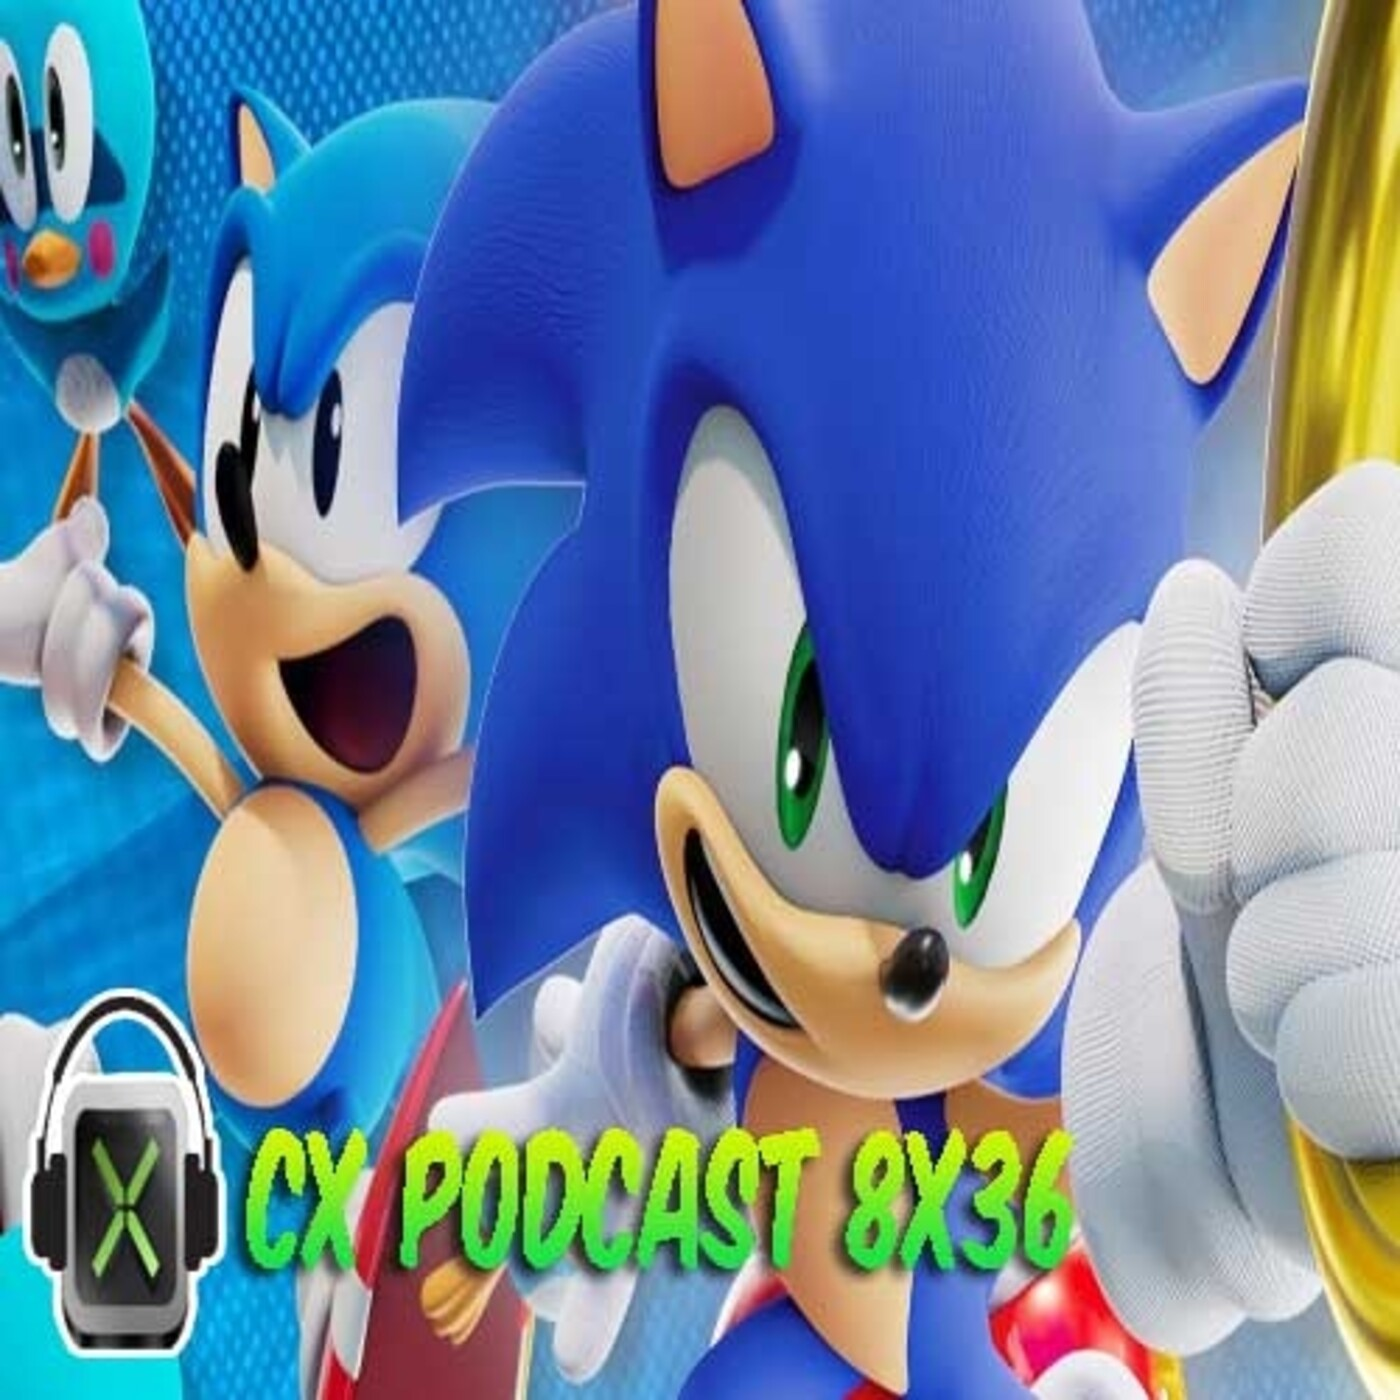 CX Podcast 8x36 I Biomutant, Sonic Central, Dragon Quest...